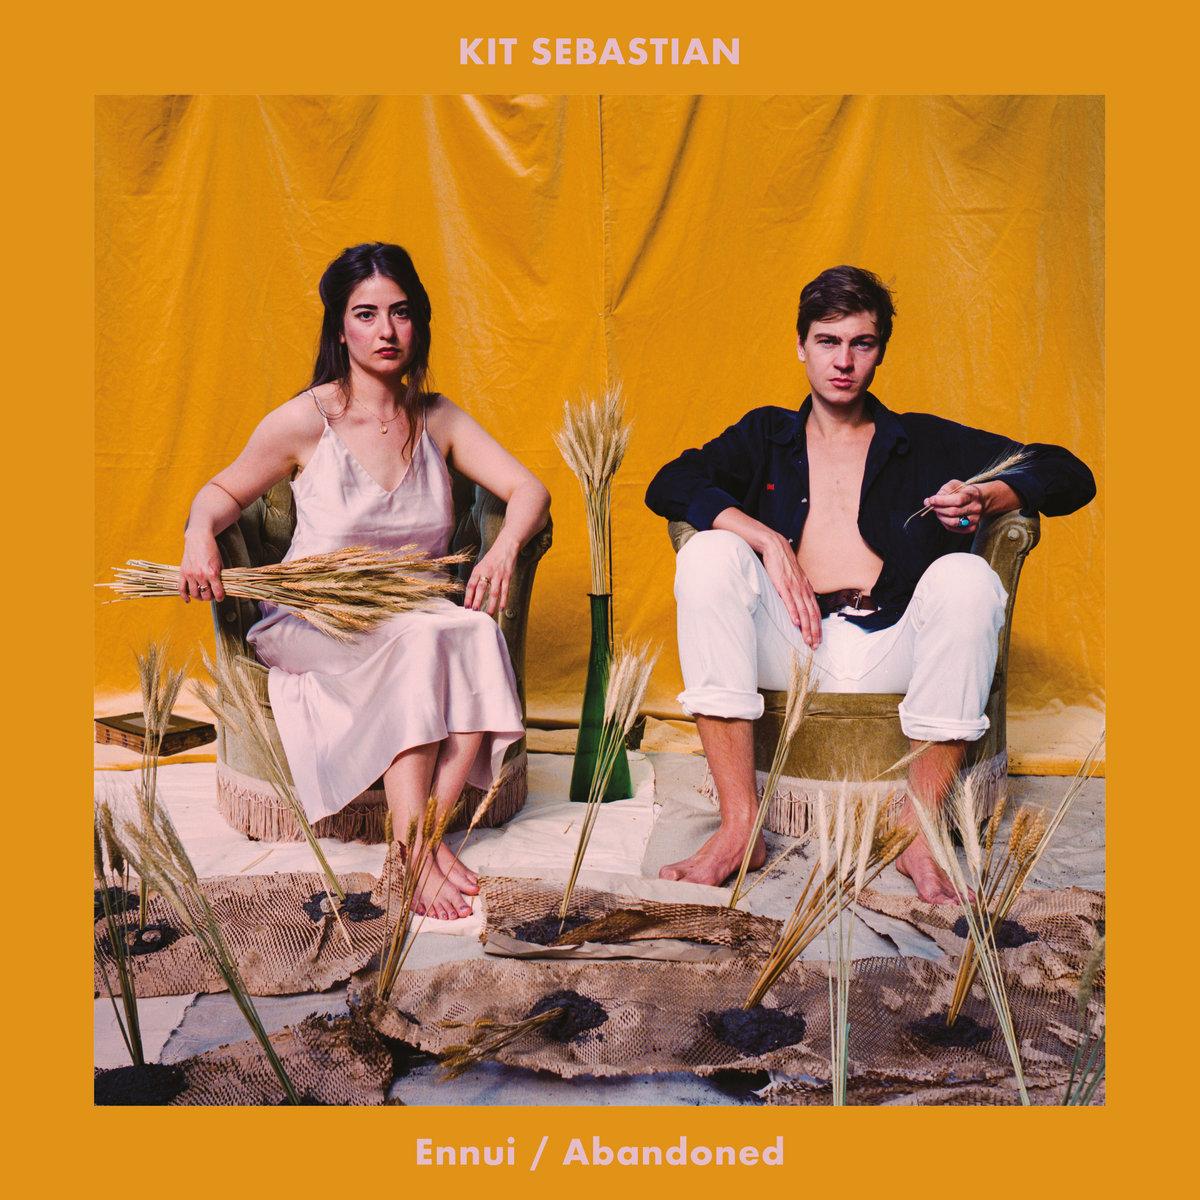 Kit Sebastian - Ennui / Abandoned